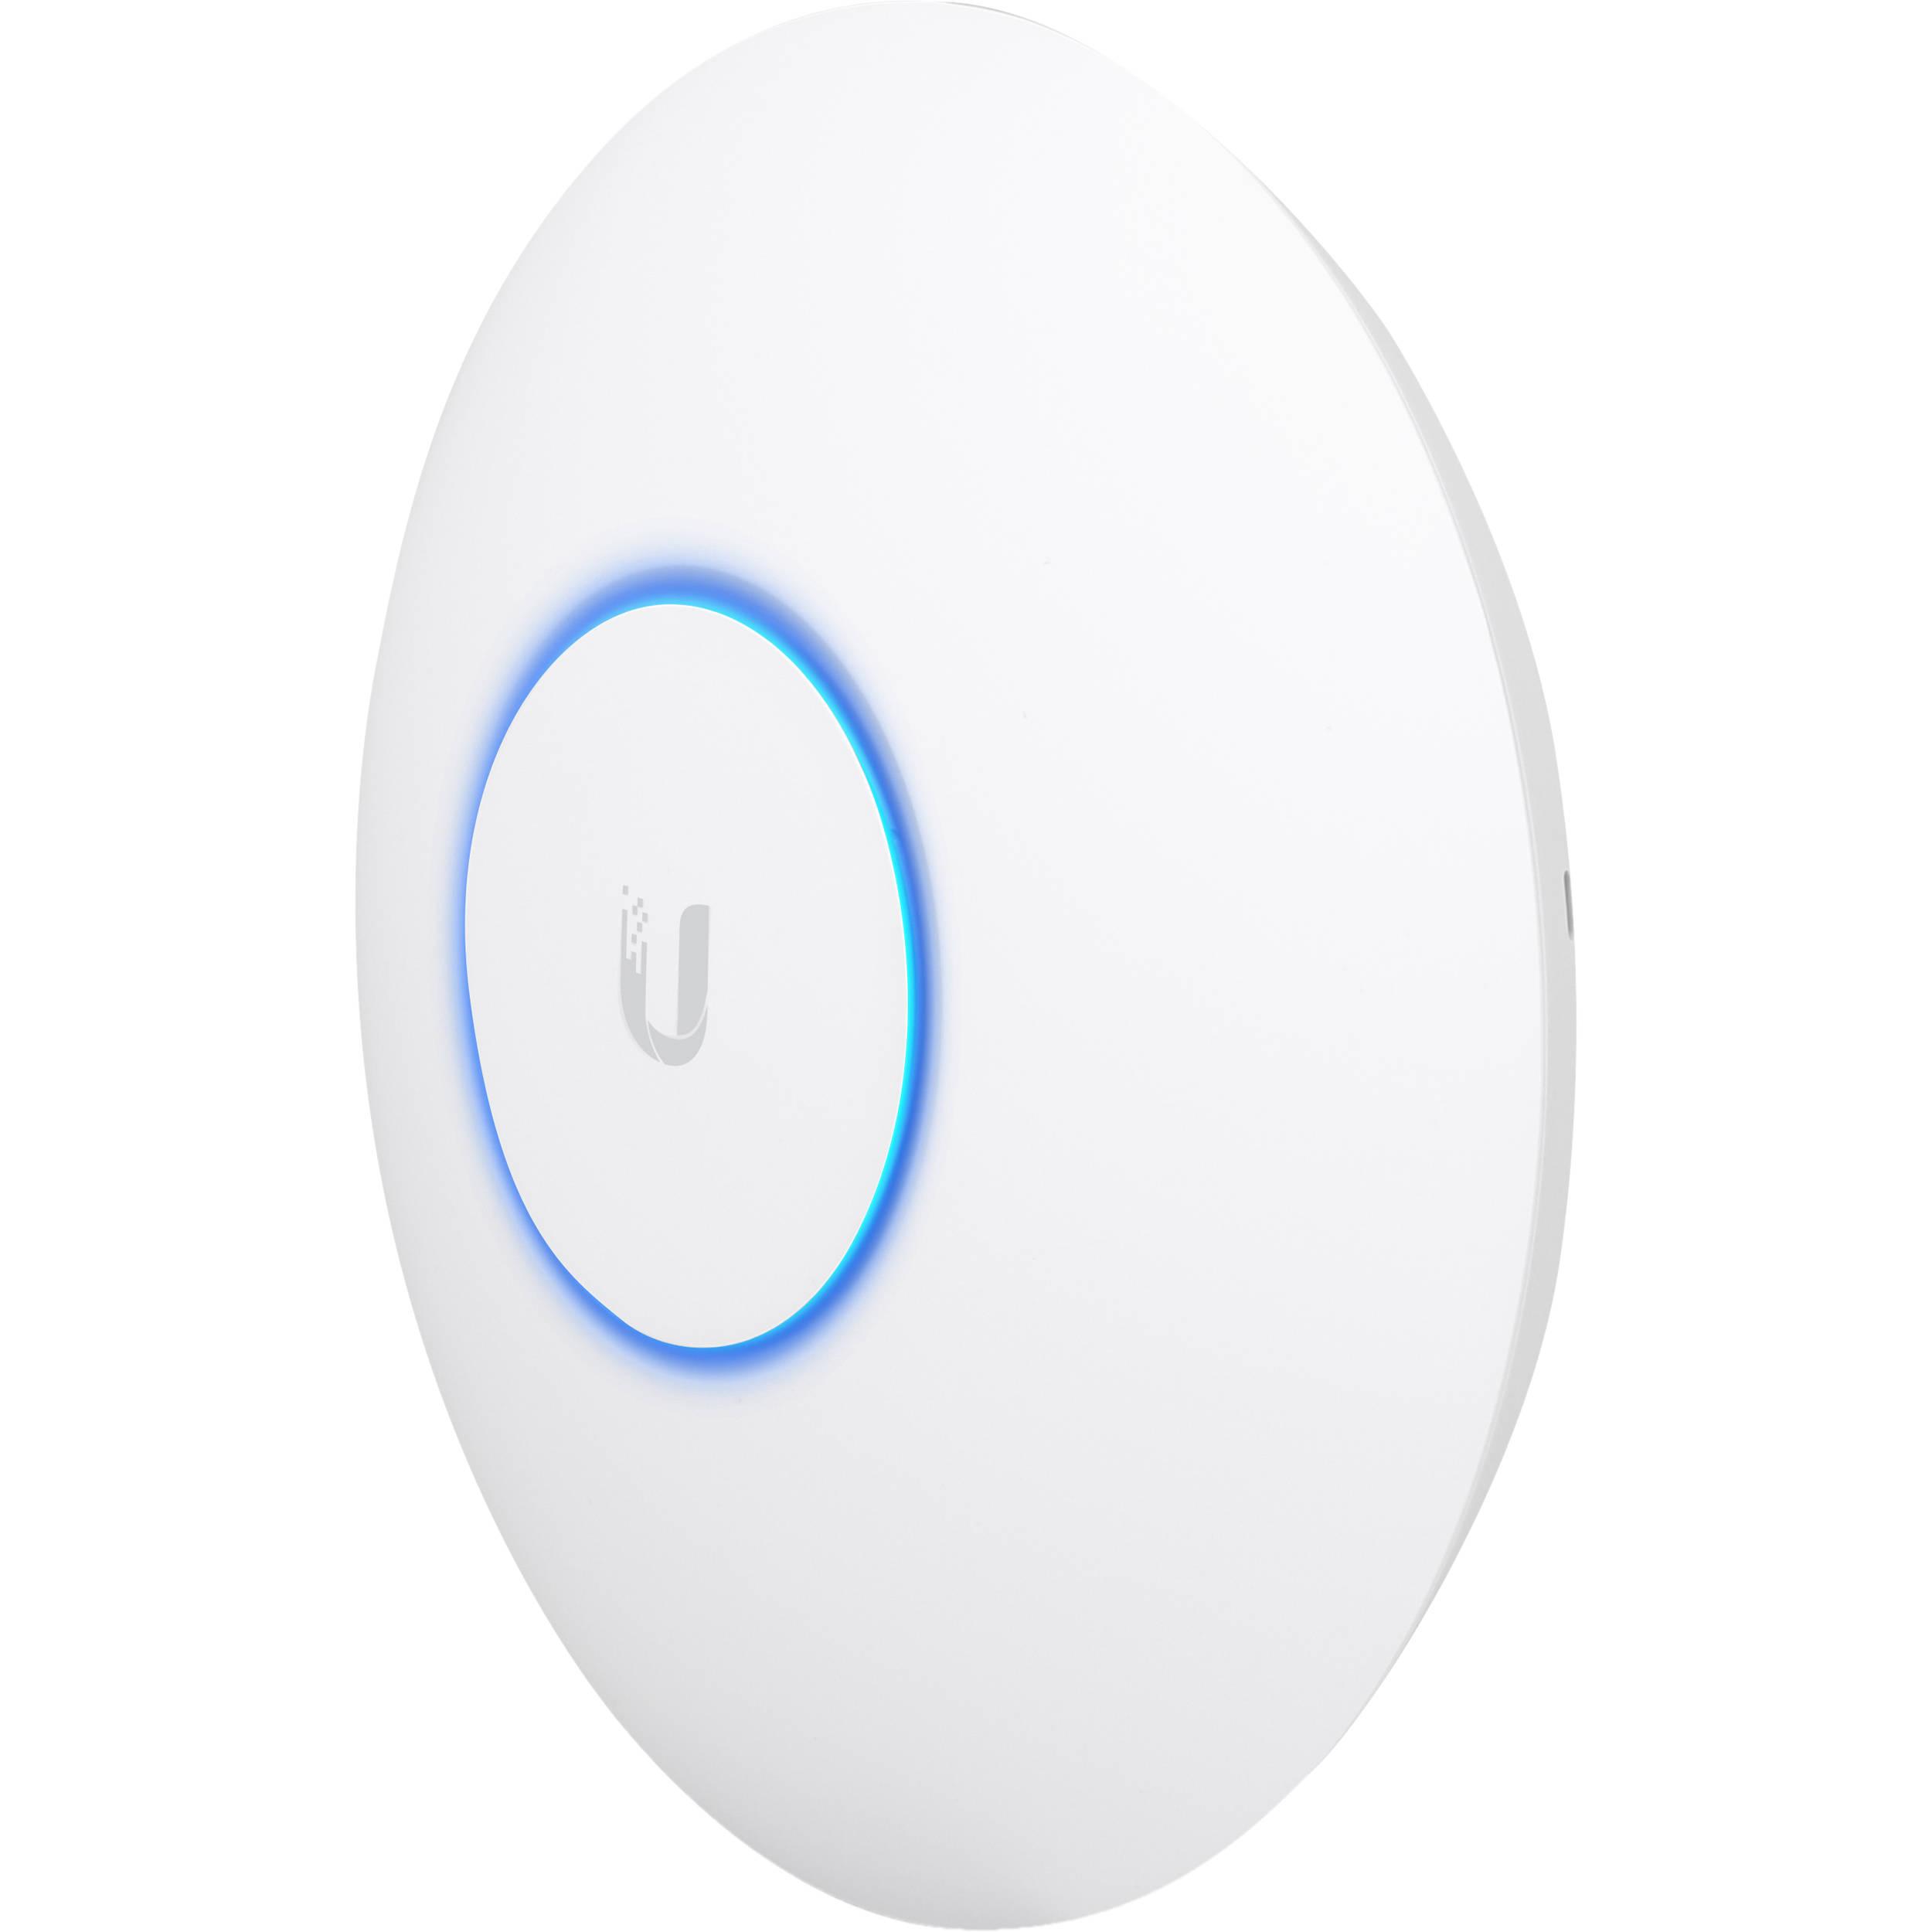 Ubiquiti Networks UAP-AC-HD-US Wave 2 Enterprise Wi-Fi Access Point (5-Pack)